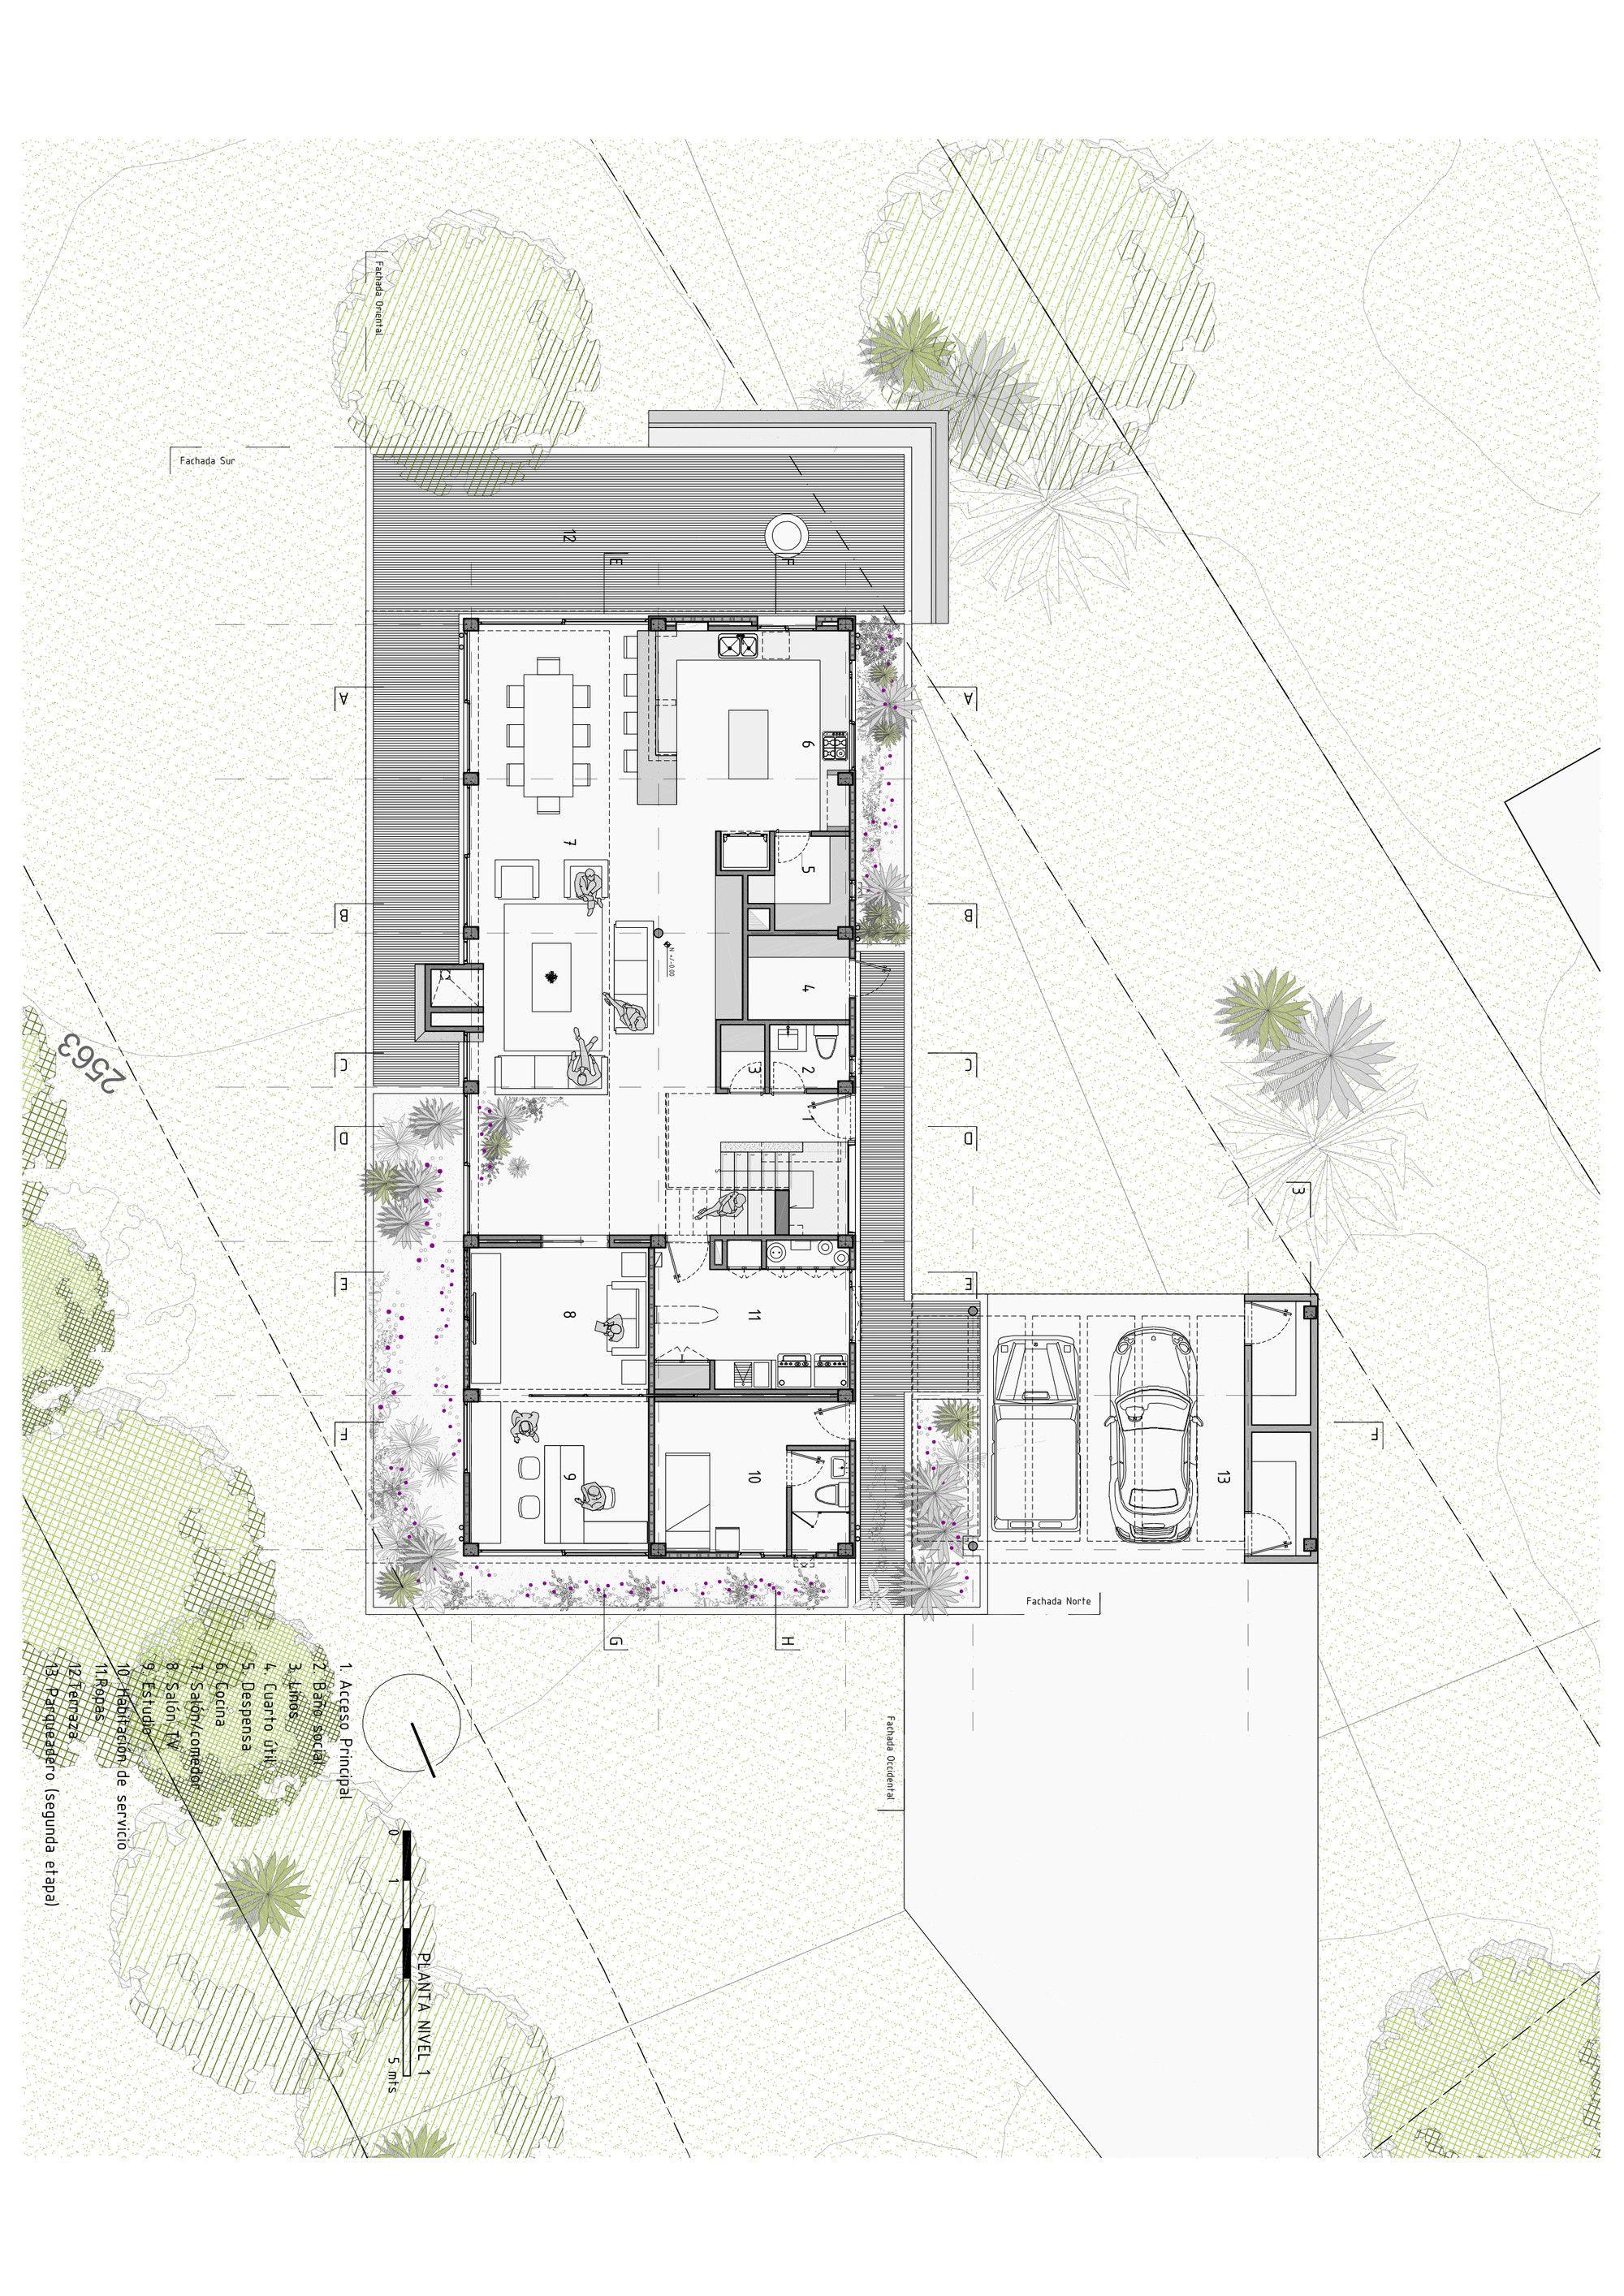 Gallery Of Bo House Plan B Arquitectos 21 Architectural Floor Plans Layout Architecture Architecture Plan